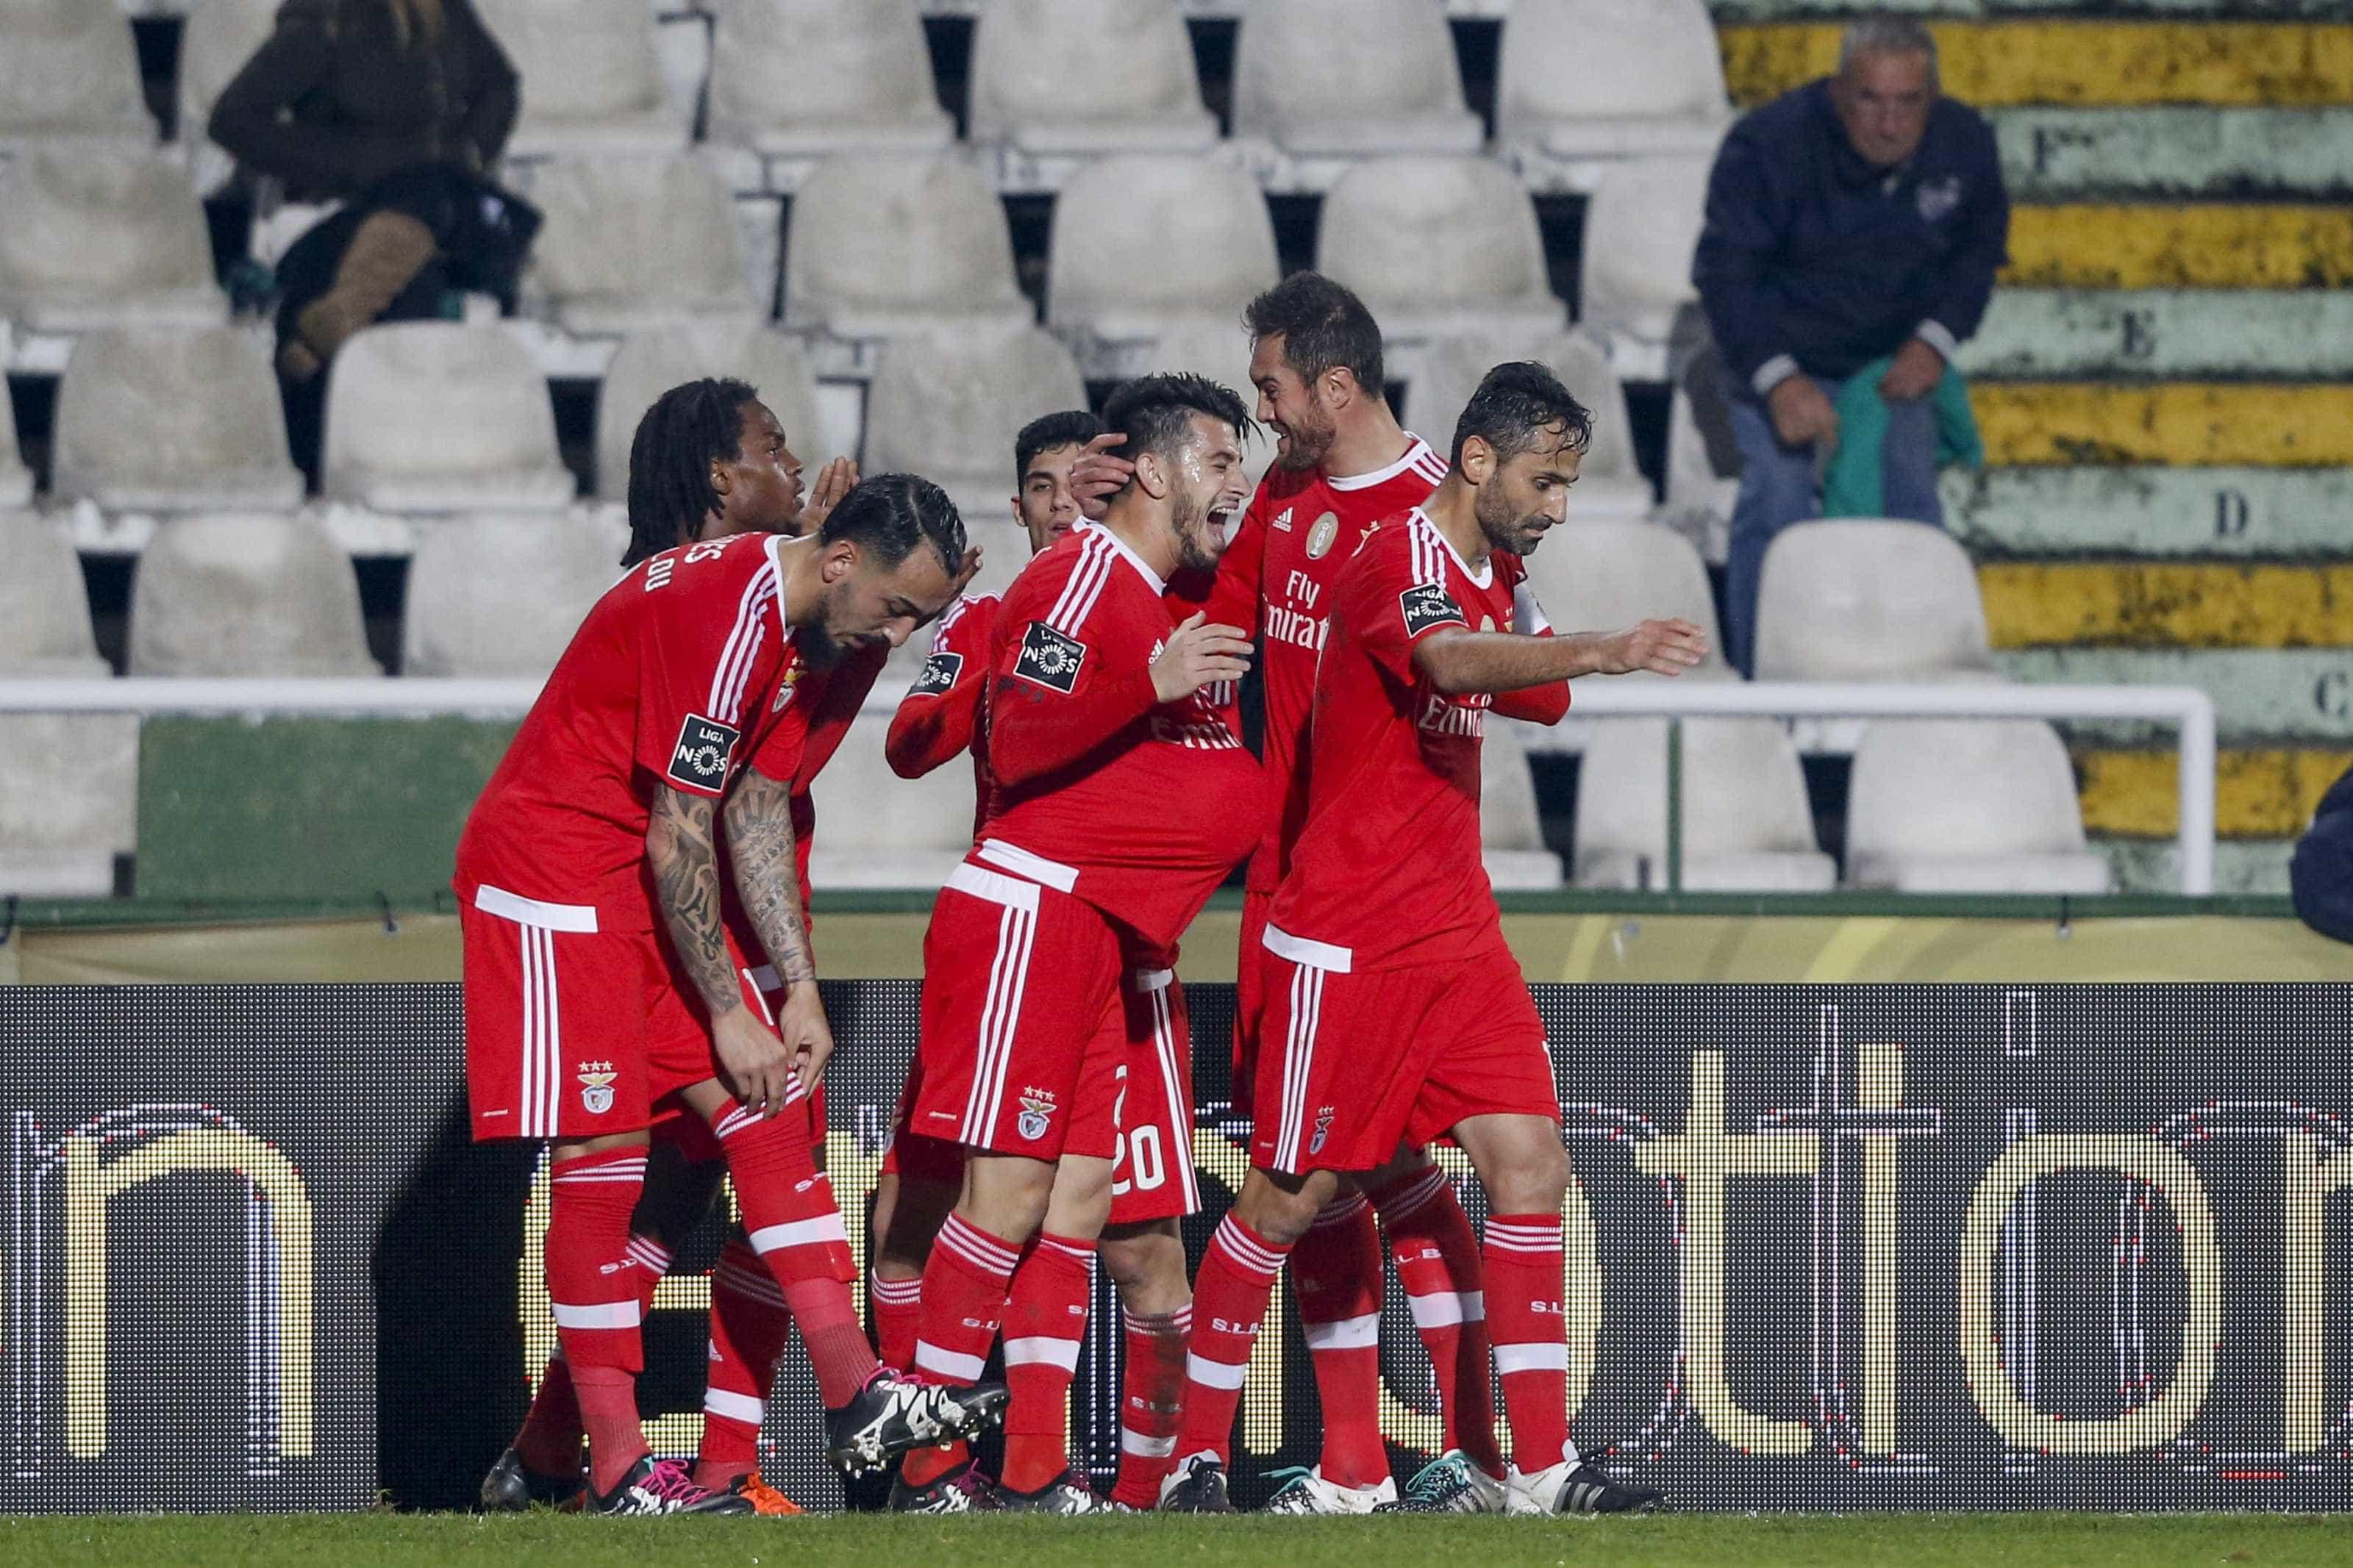 Benfica - Vitória de Setúbal